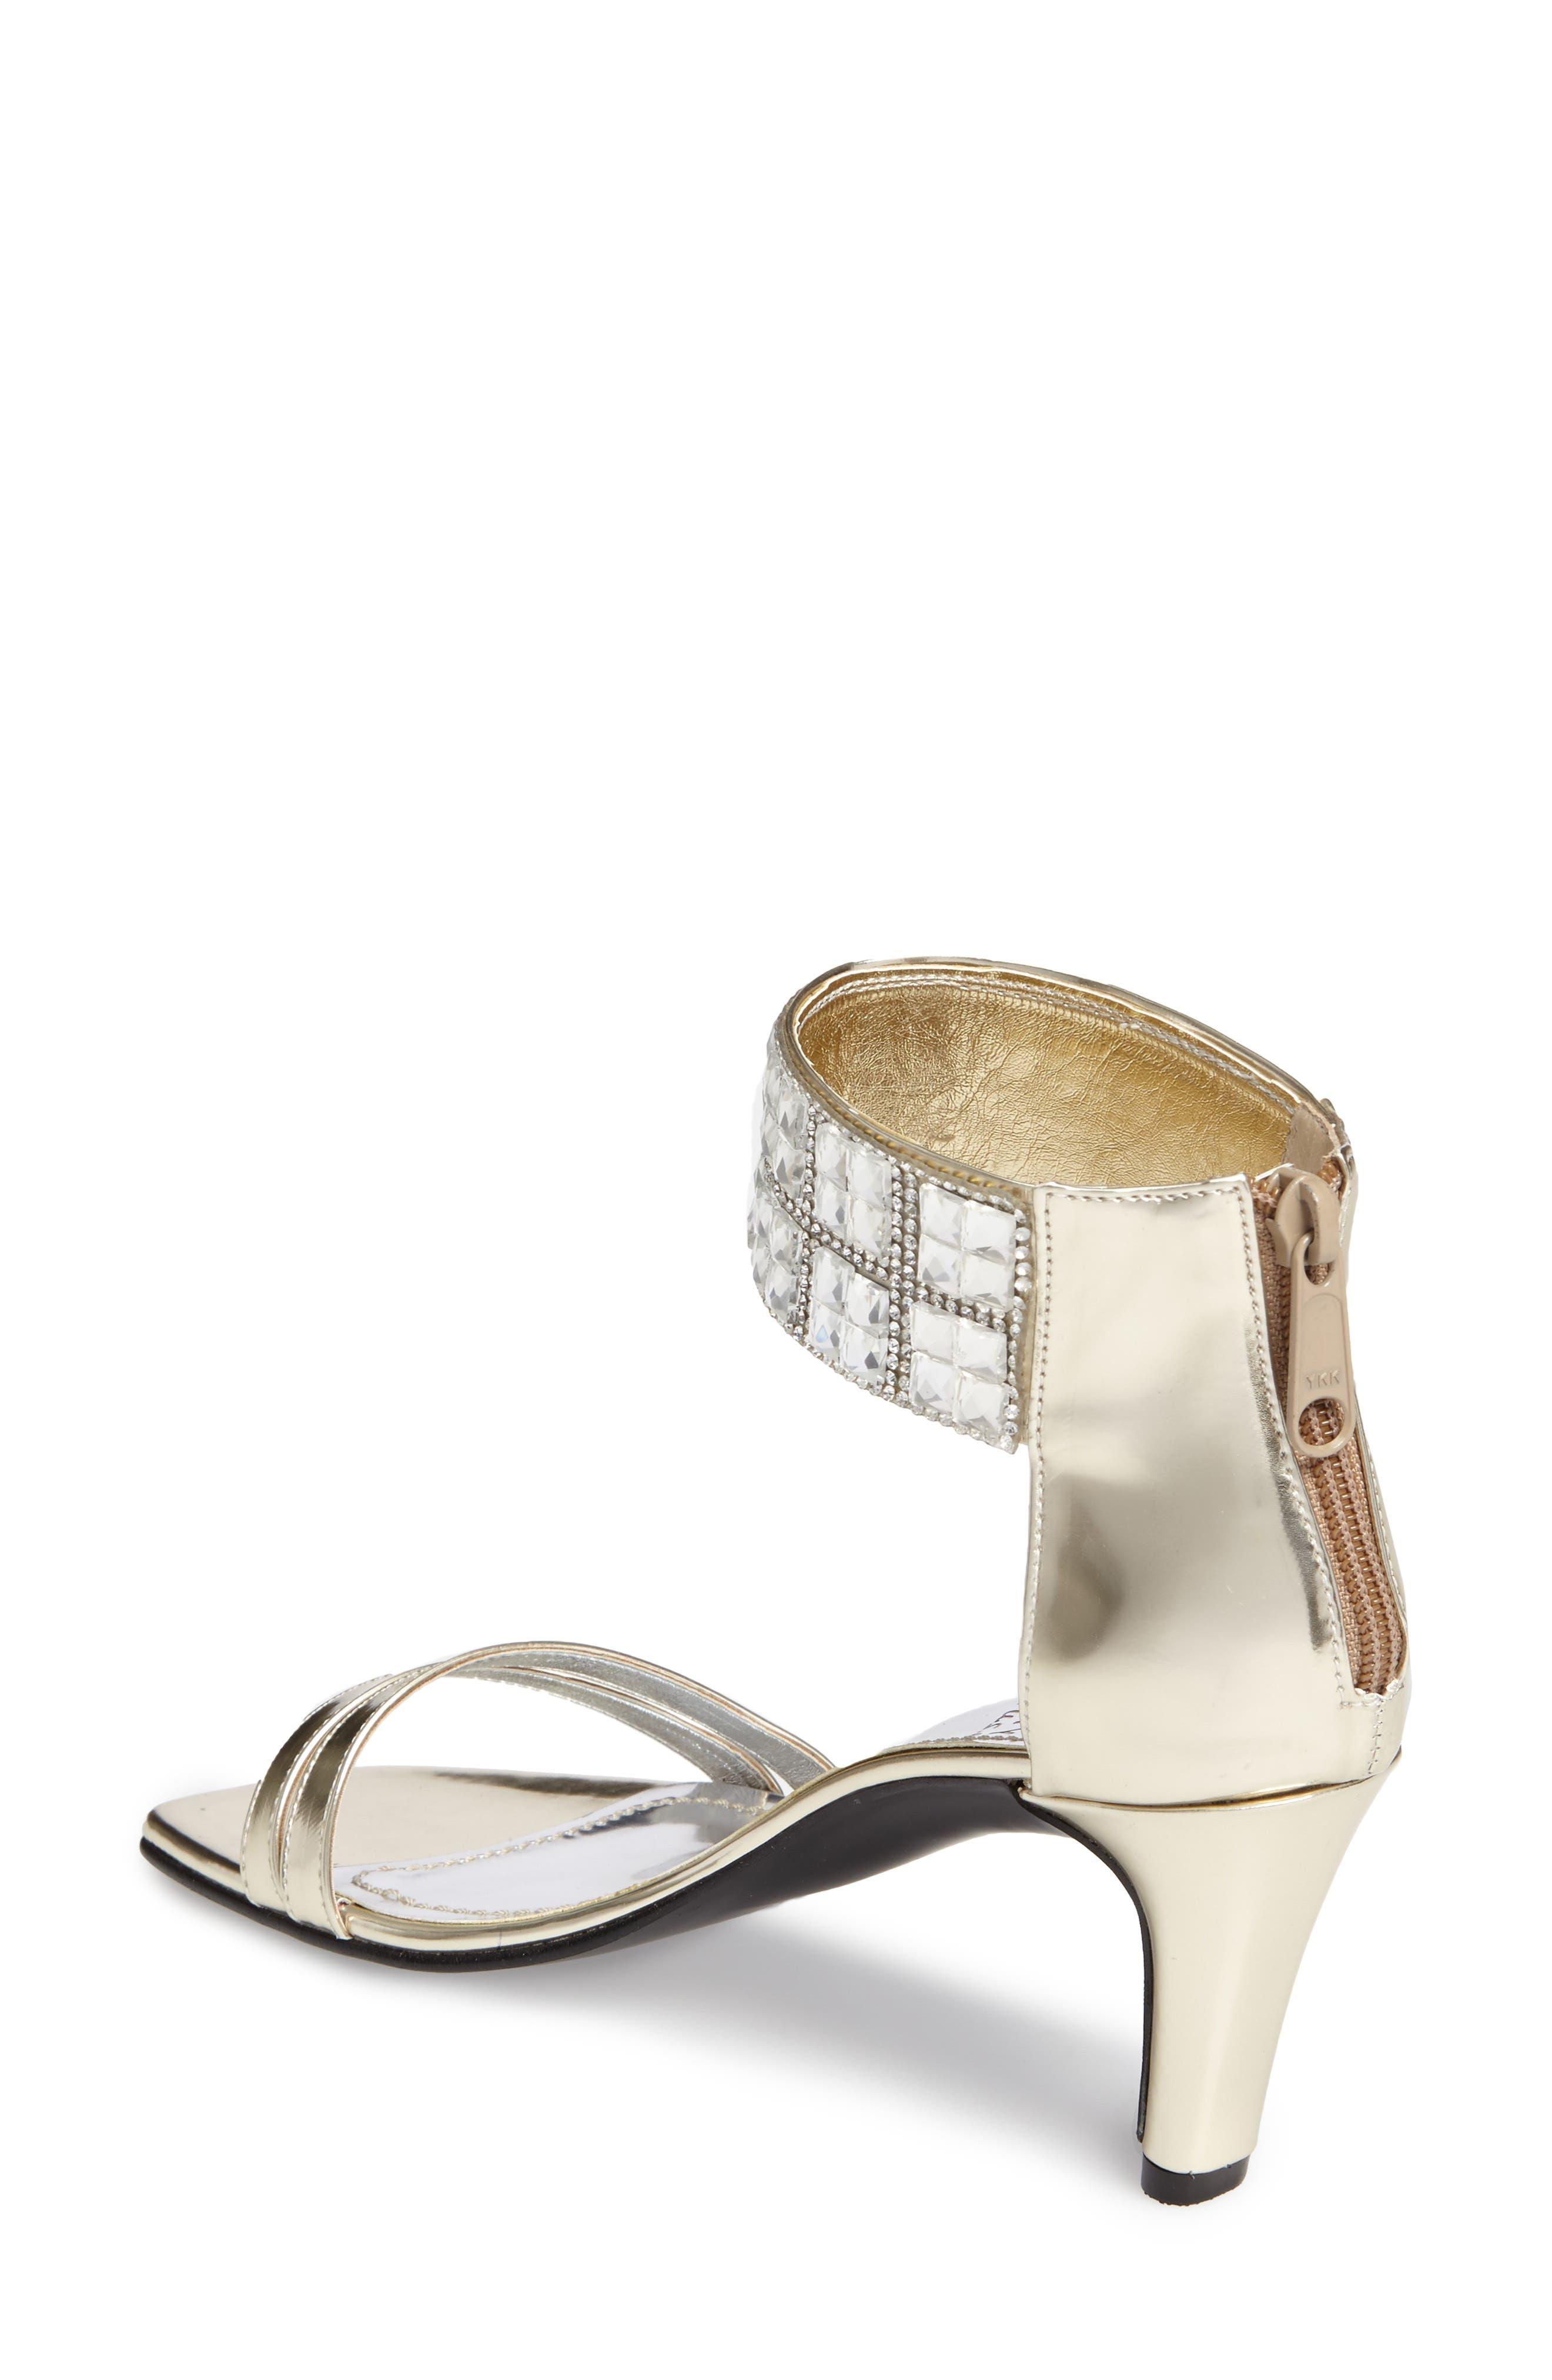 Scarlett Crystal Embellished Evening Sandal,                             Alternate thumbnail 3, color,                             PLATINUM FAUX LEATHER